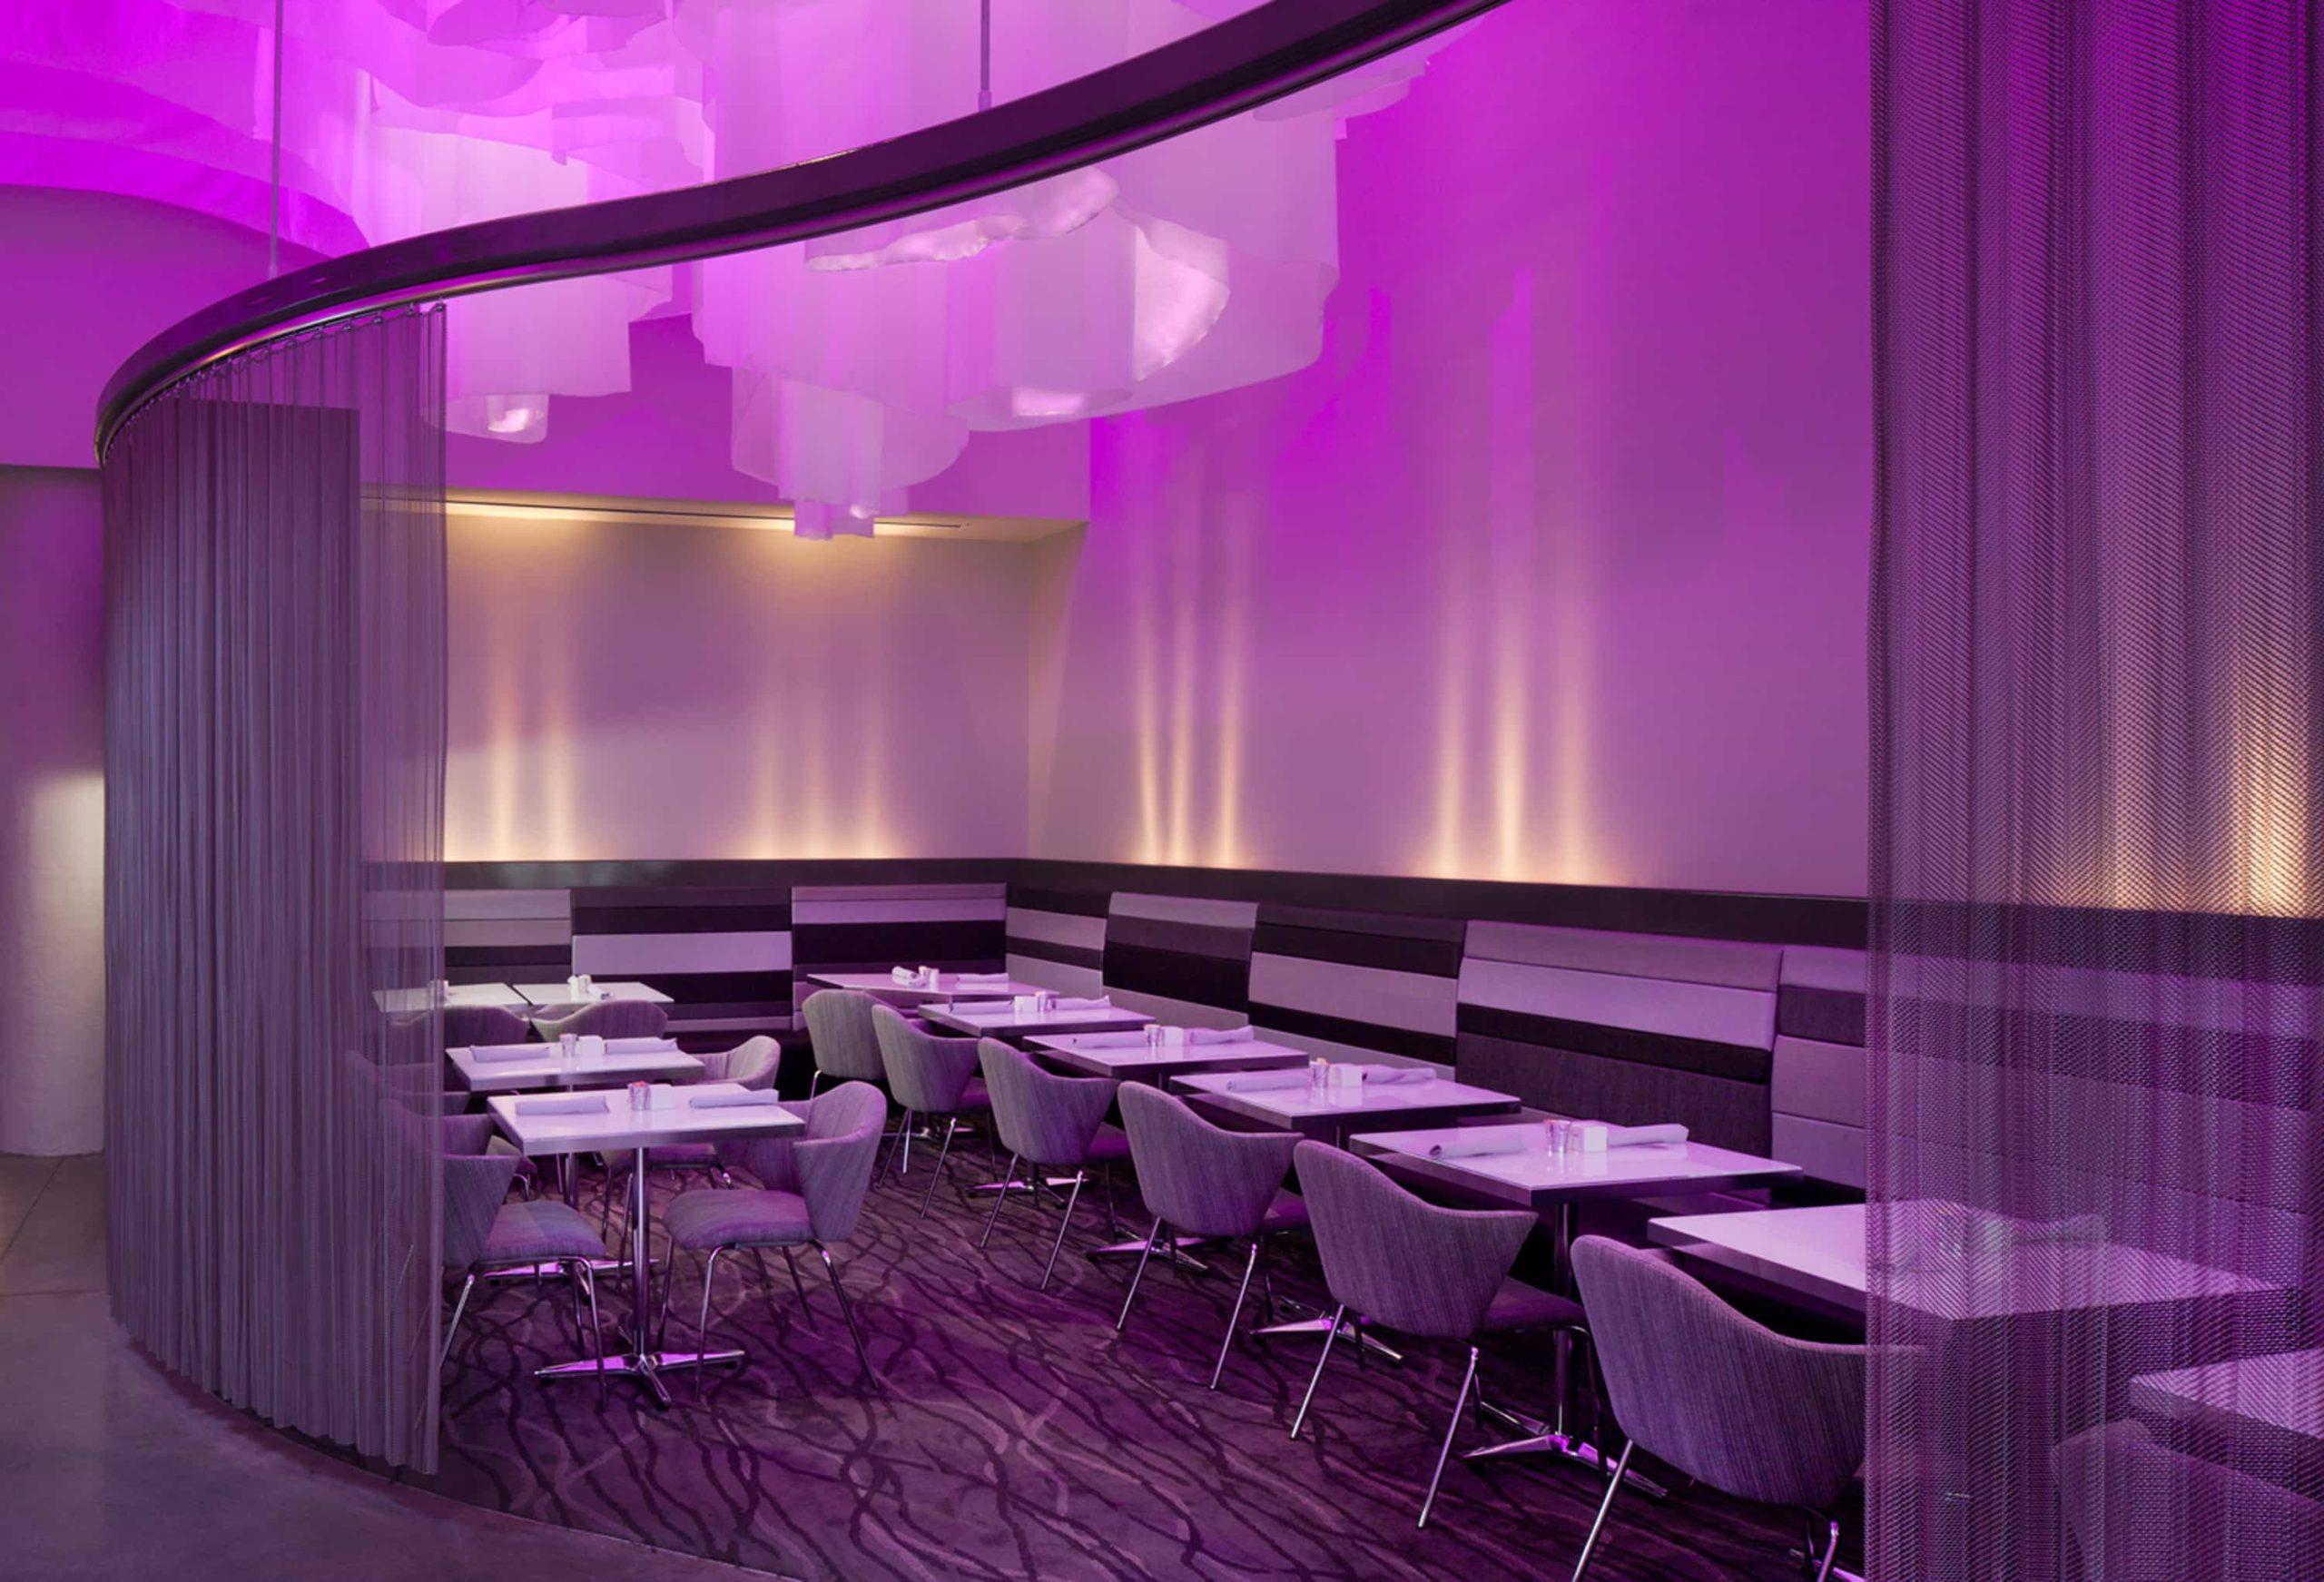 09_PuraVida Lounge